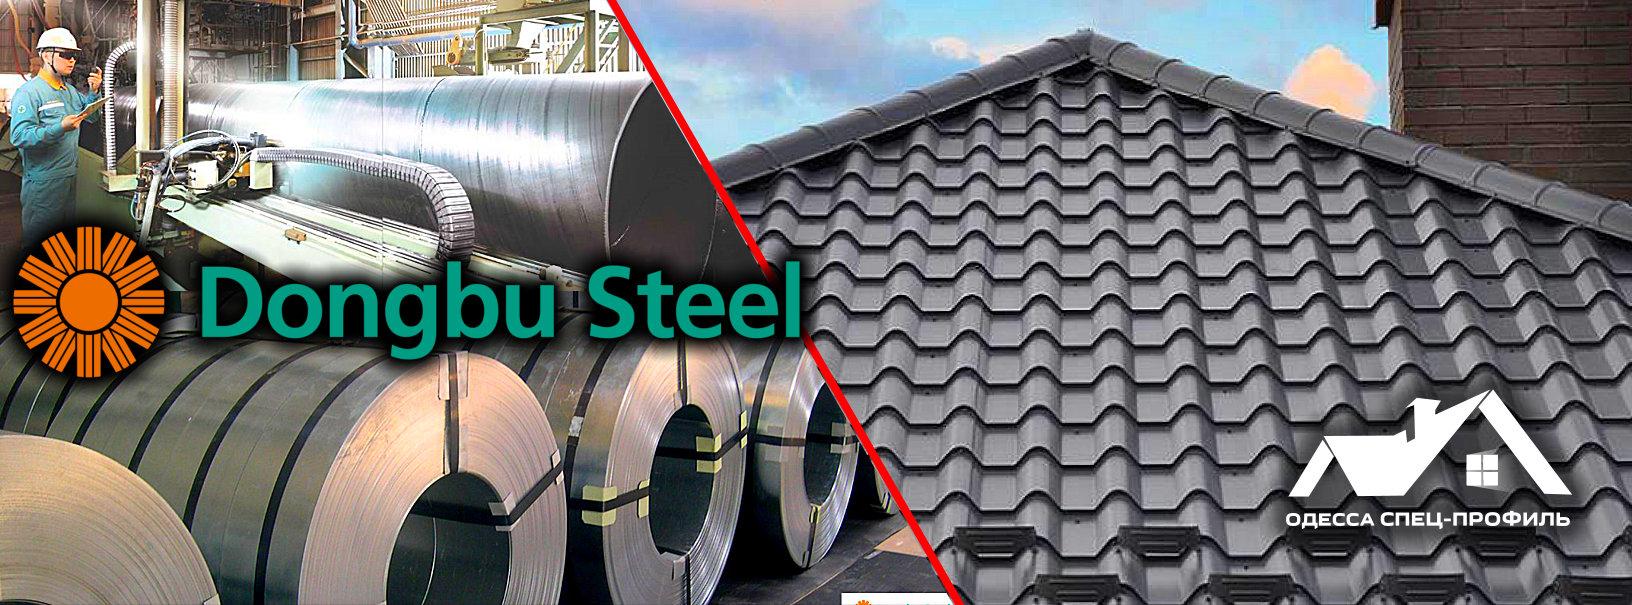 оцинкованная сталь Dongbu Steel